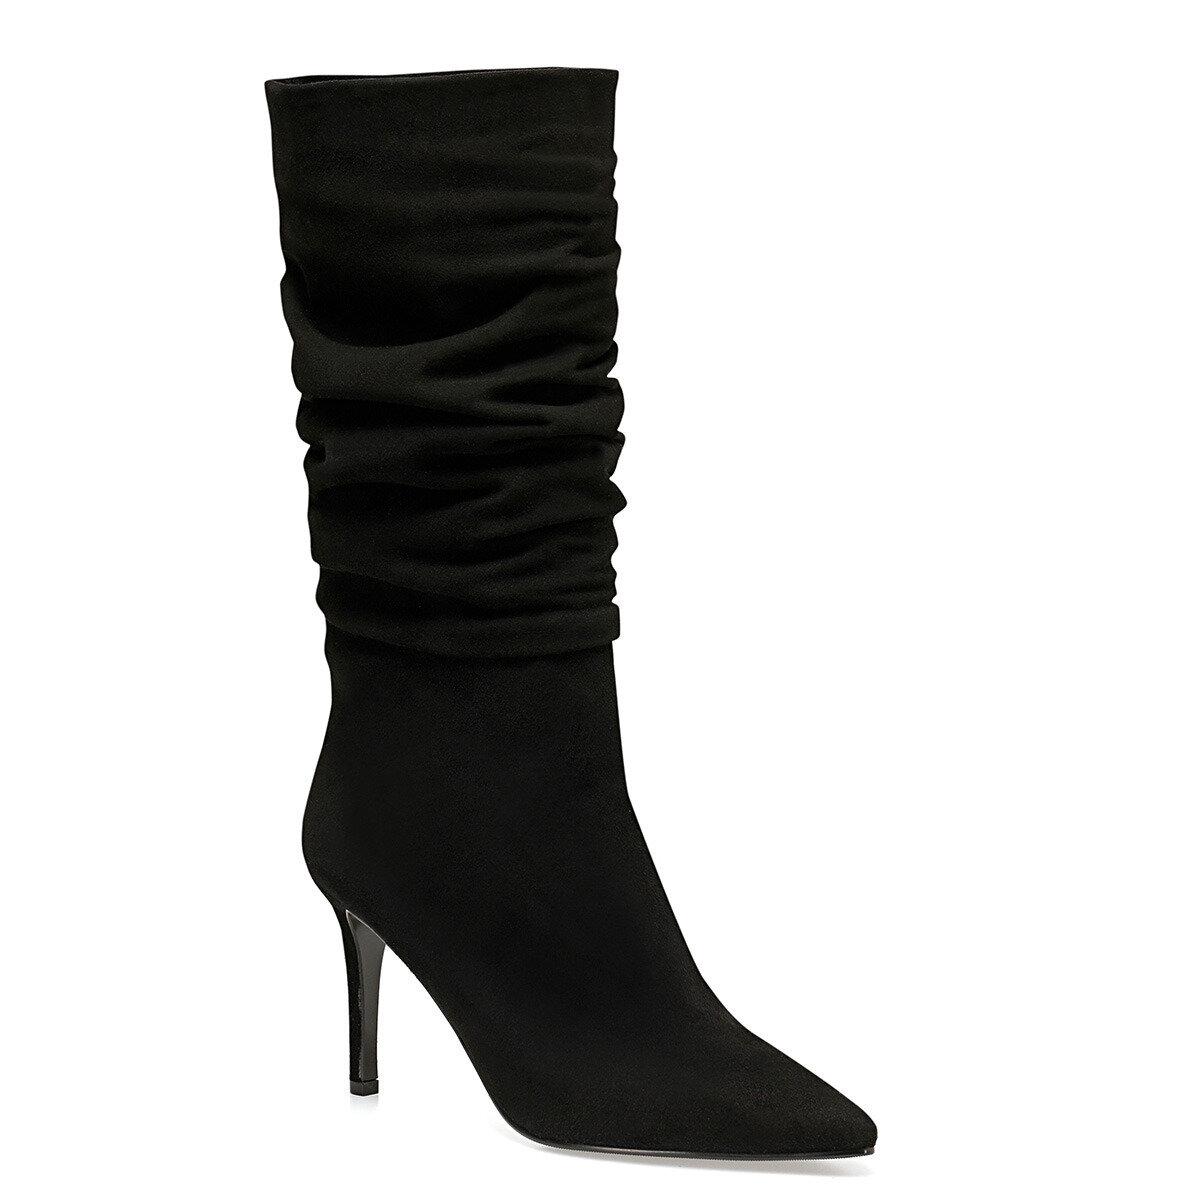 MOLLY Siyah Kadın Ökçeli Çizme